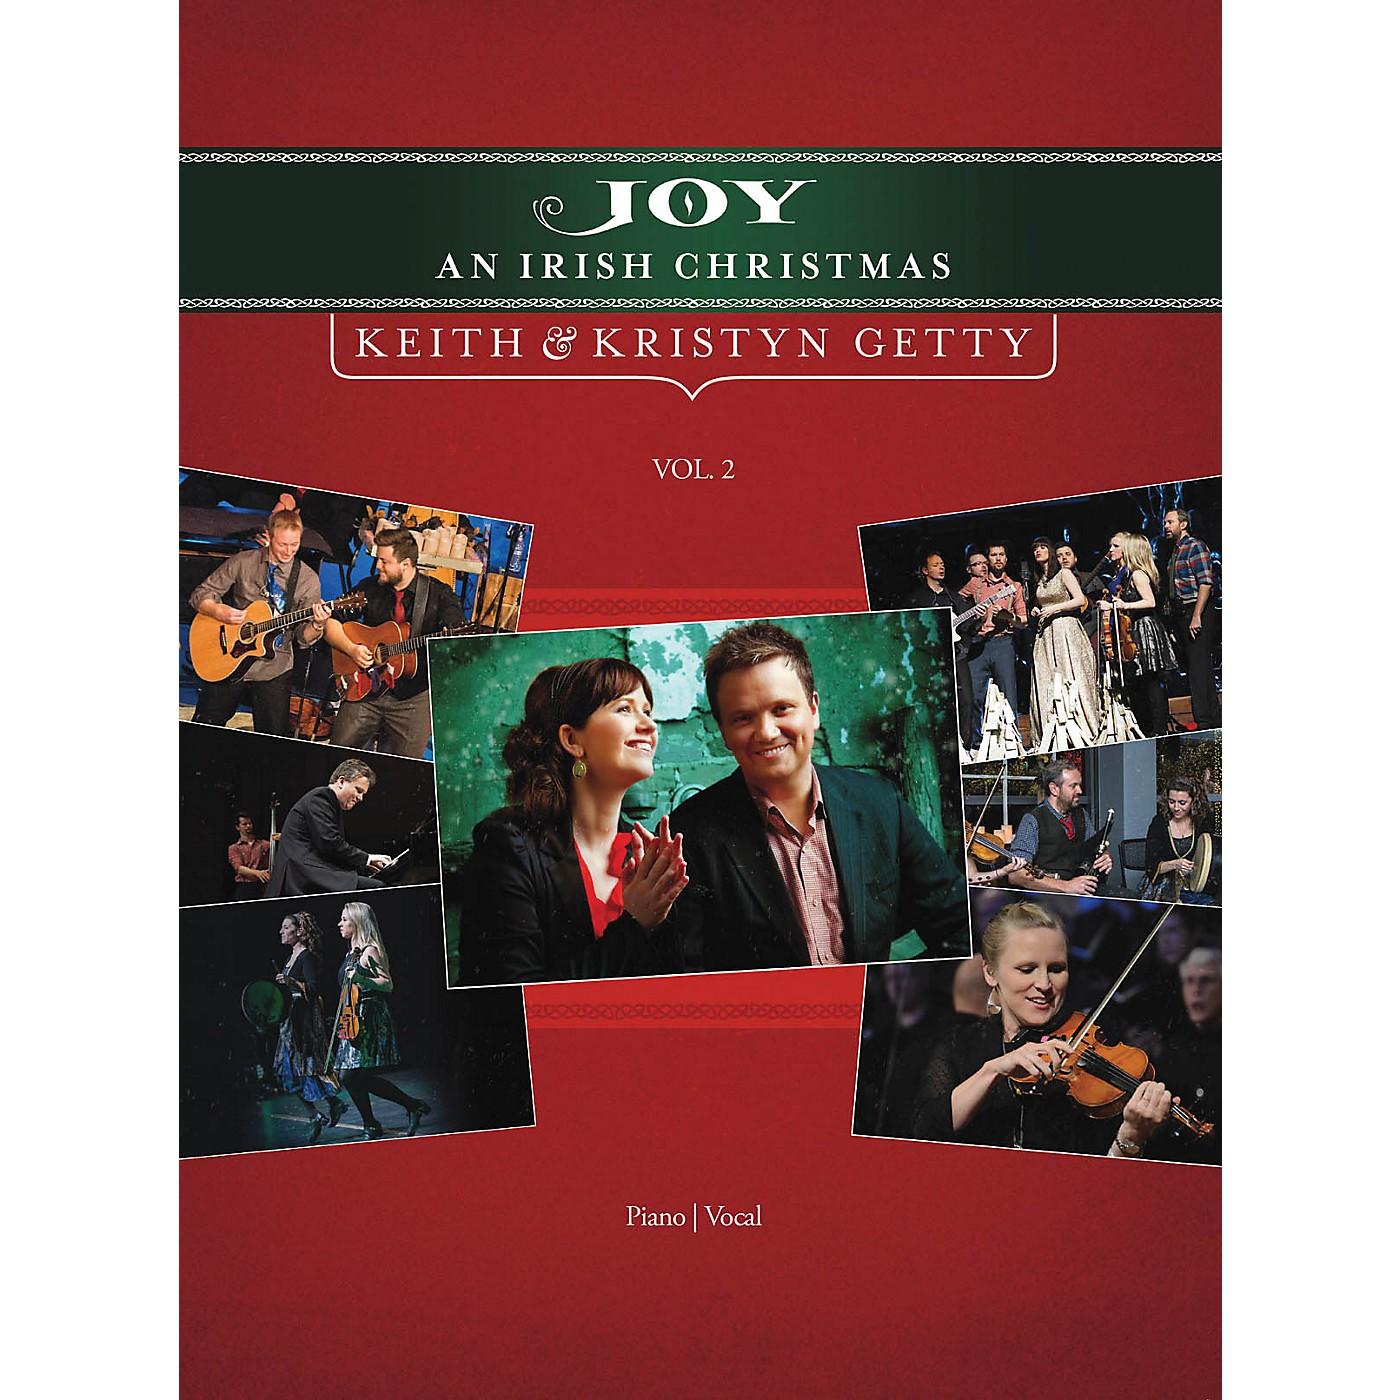 Hal Leonard Keith and Kristyn Getty - Joy: An Irish Christmas Volume 2 Sacred Folio Series by Keith and Kristyn Getty thumbnail